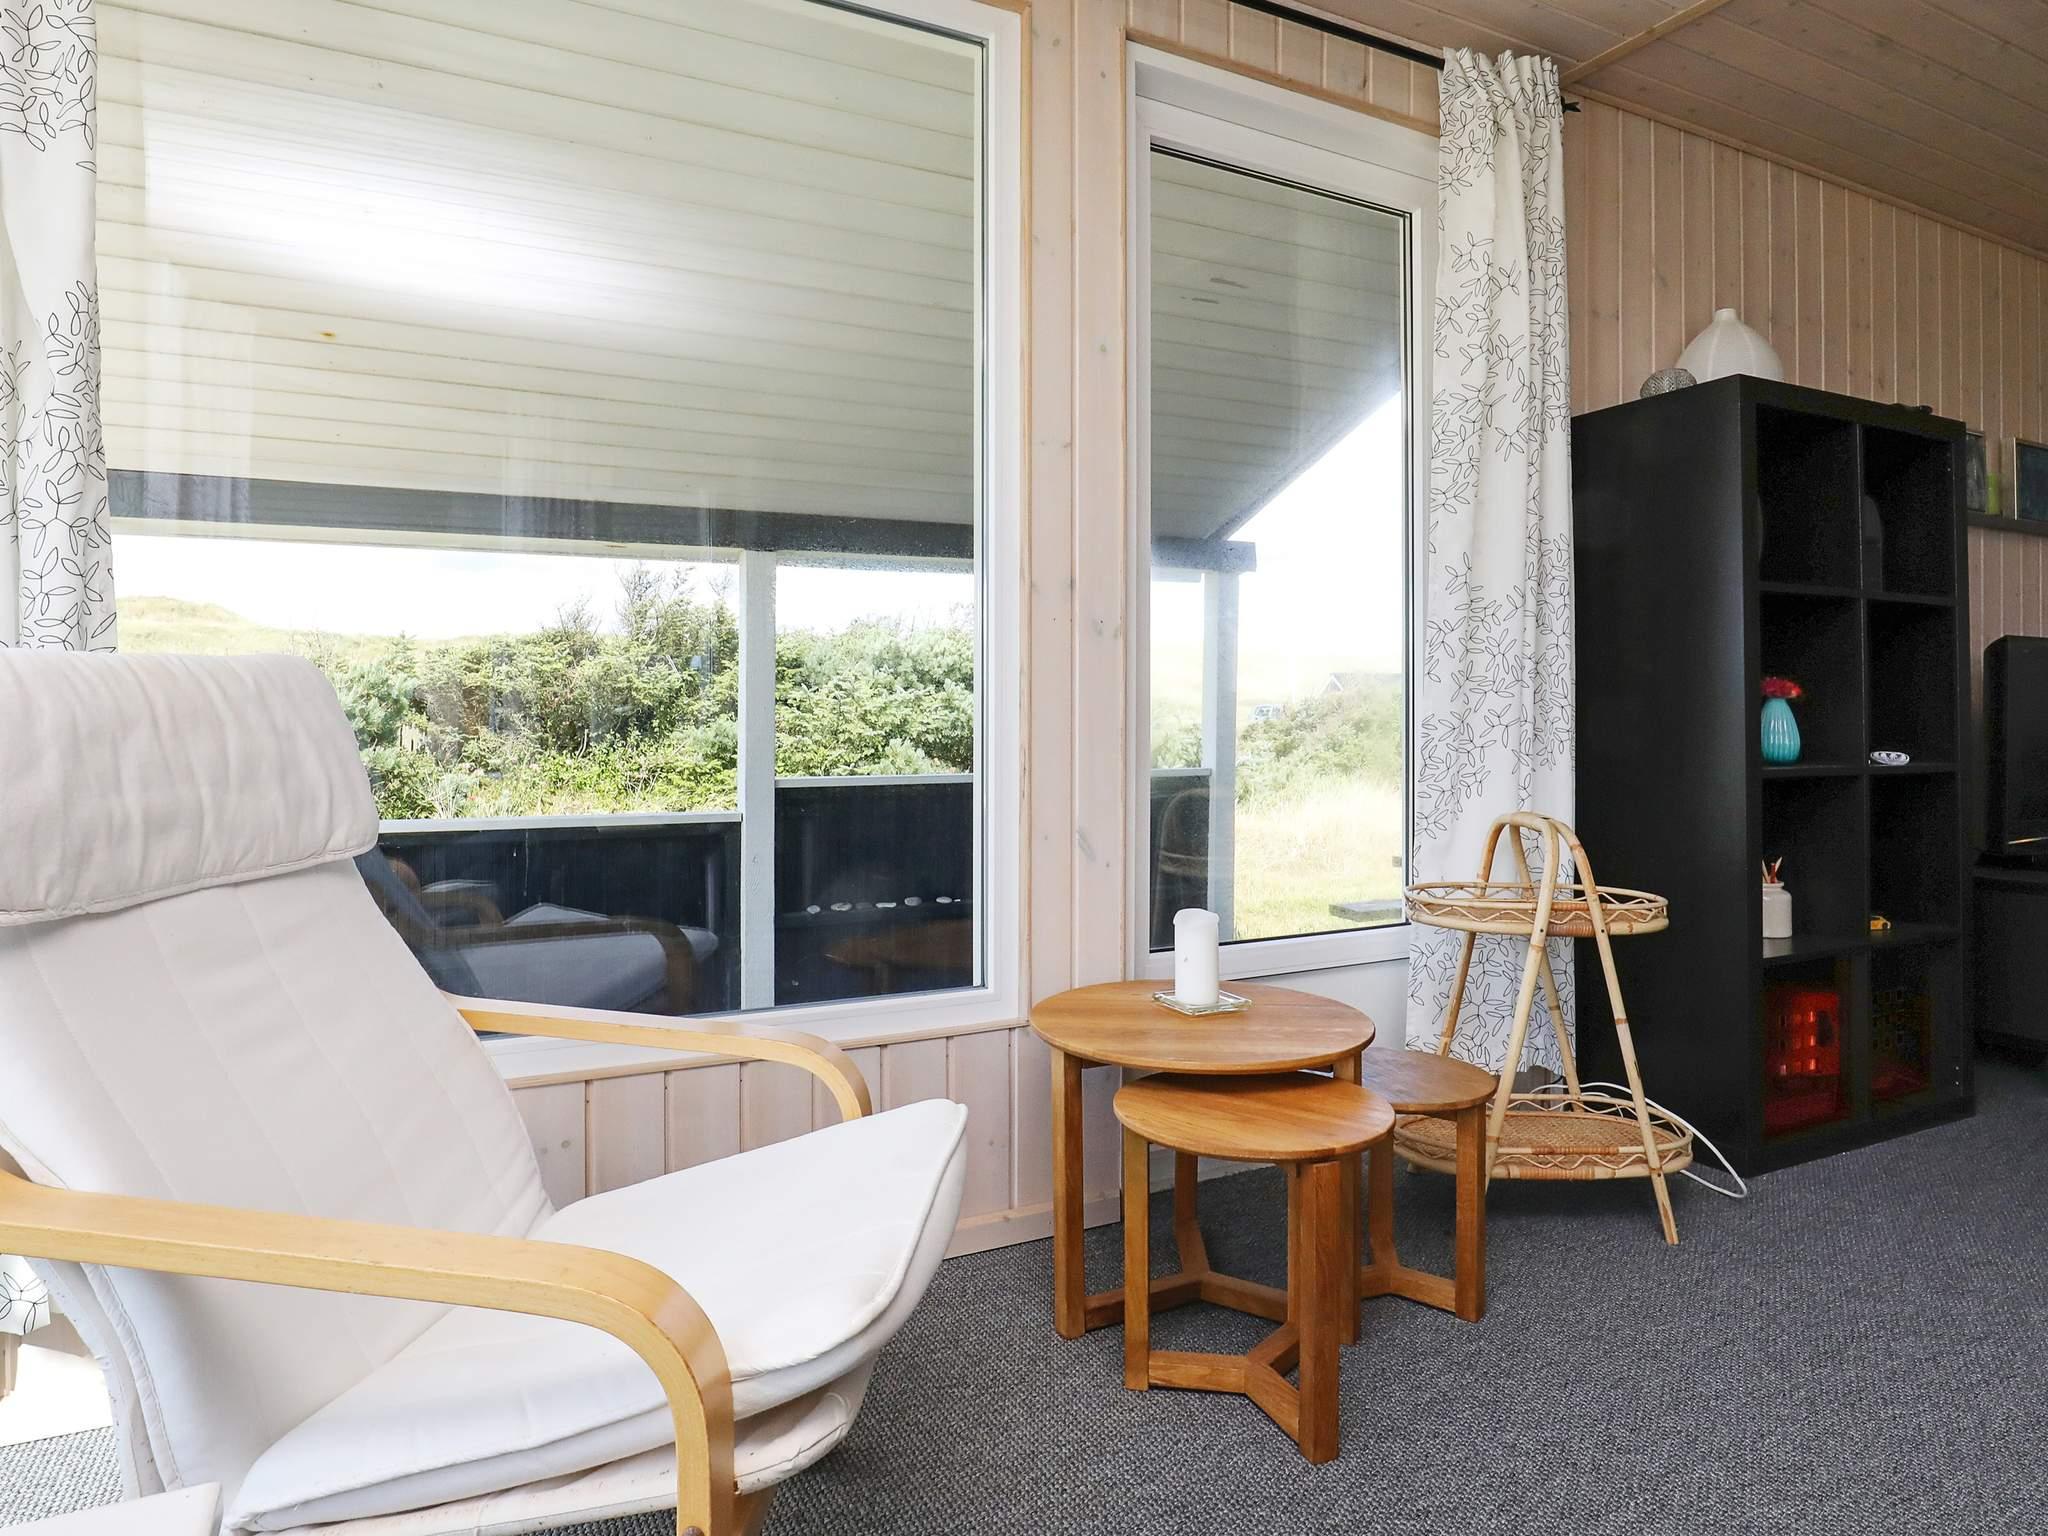 Ferienhaus Vrist (81919), Vrist, , Limfjord, Dänemark, Bild 6